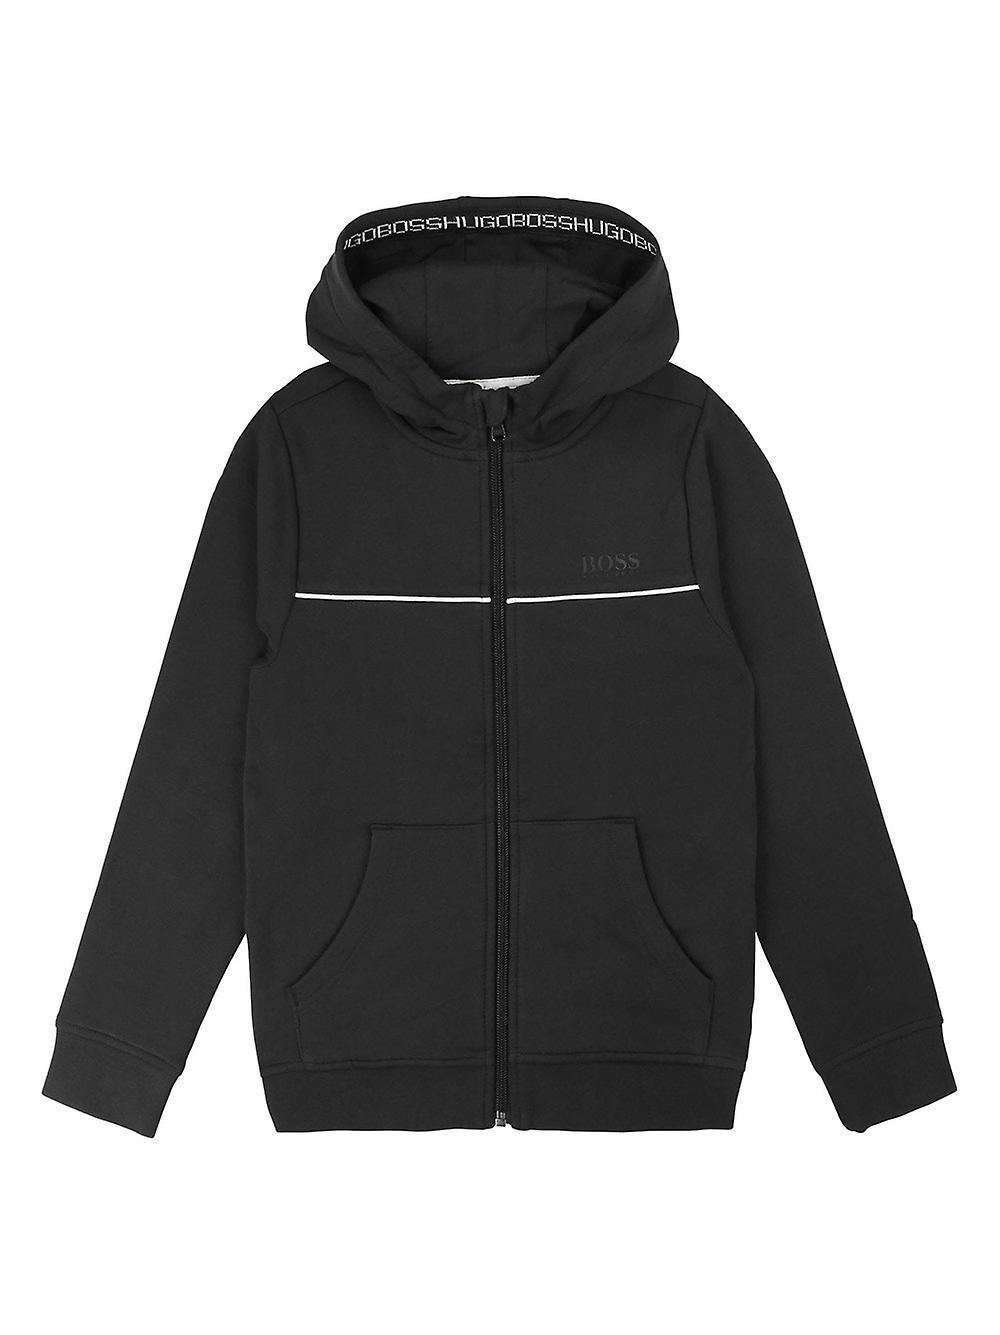 BOSS Enfantswear BOSS noir Cotton encapuchonné Sweatshirt